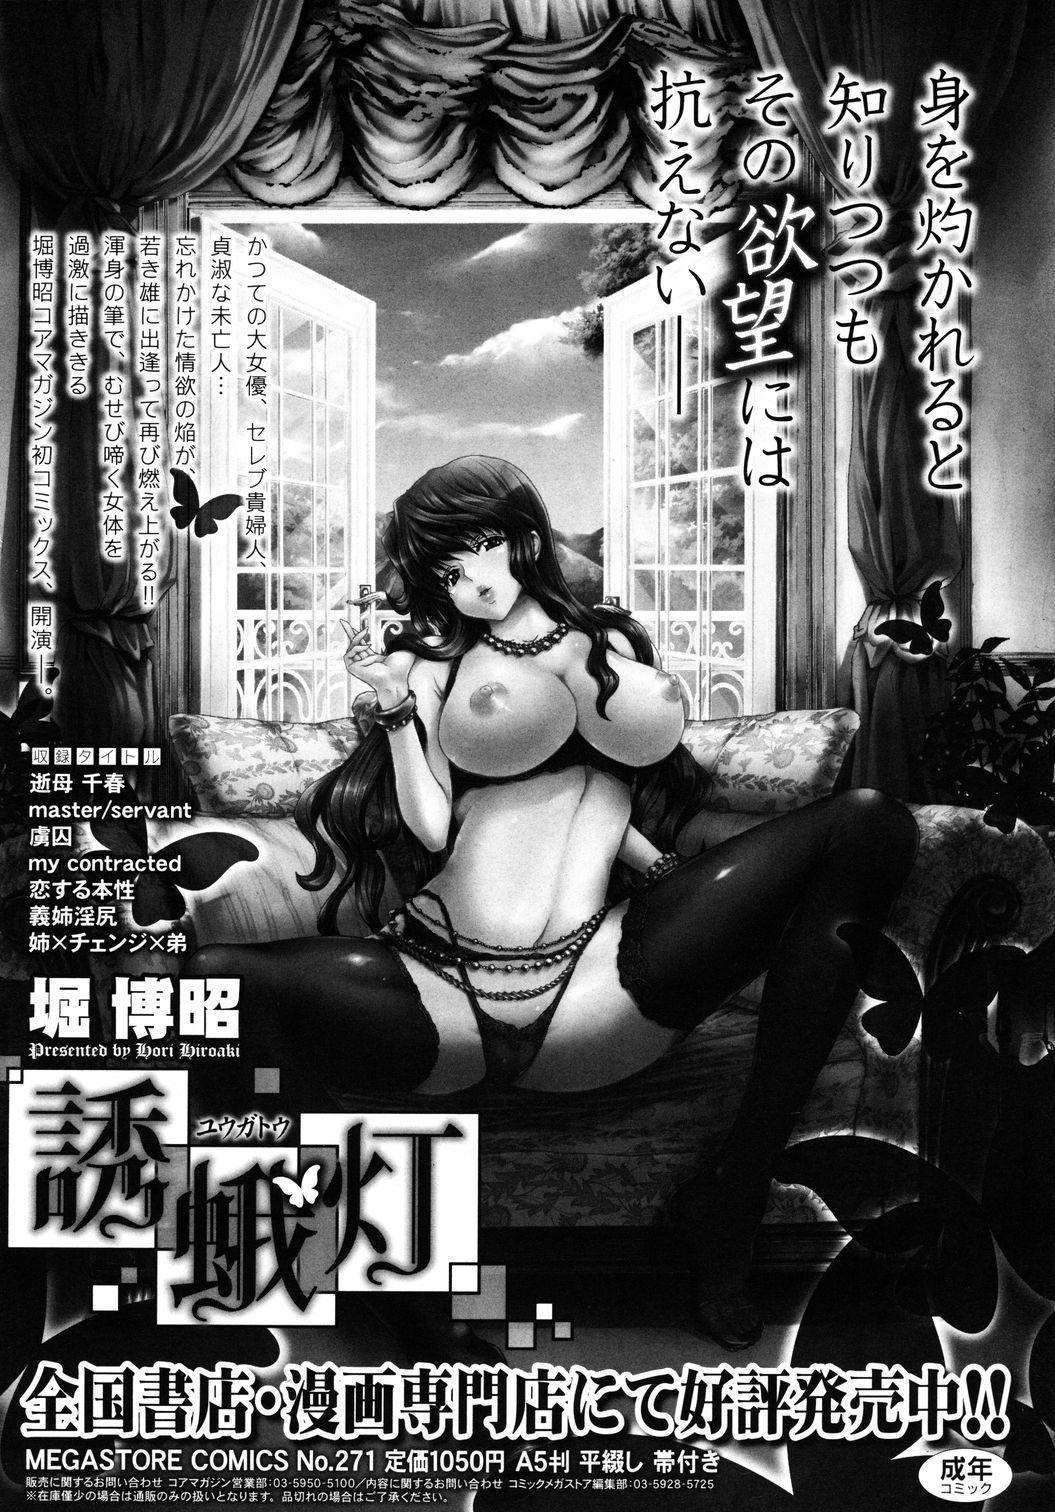 COMIC Megastore 2010-10 129